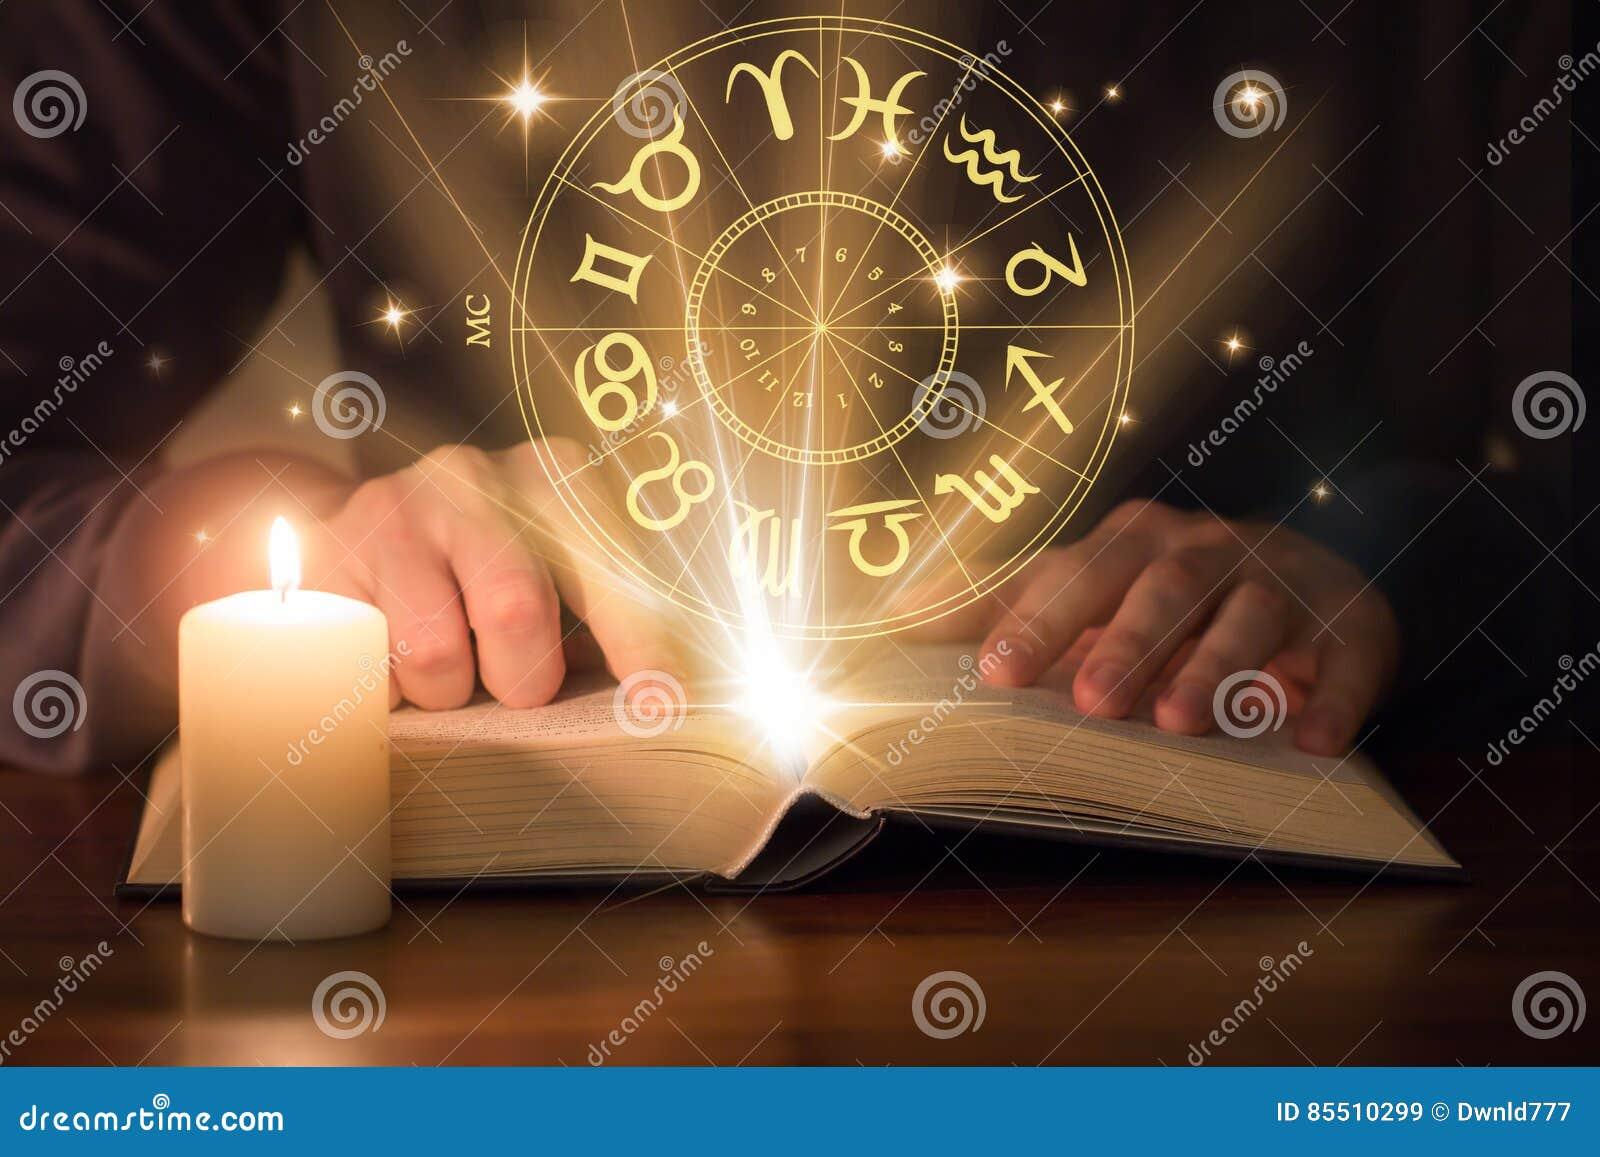 Man reading astrology book